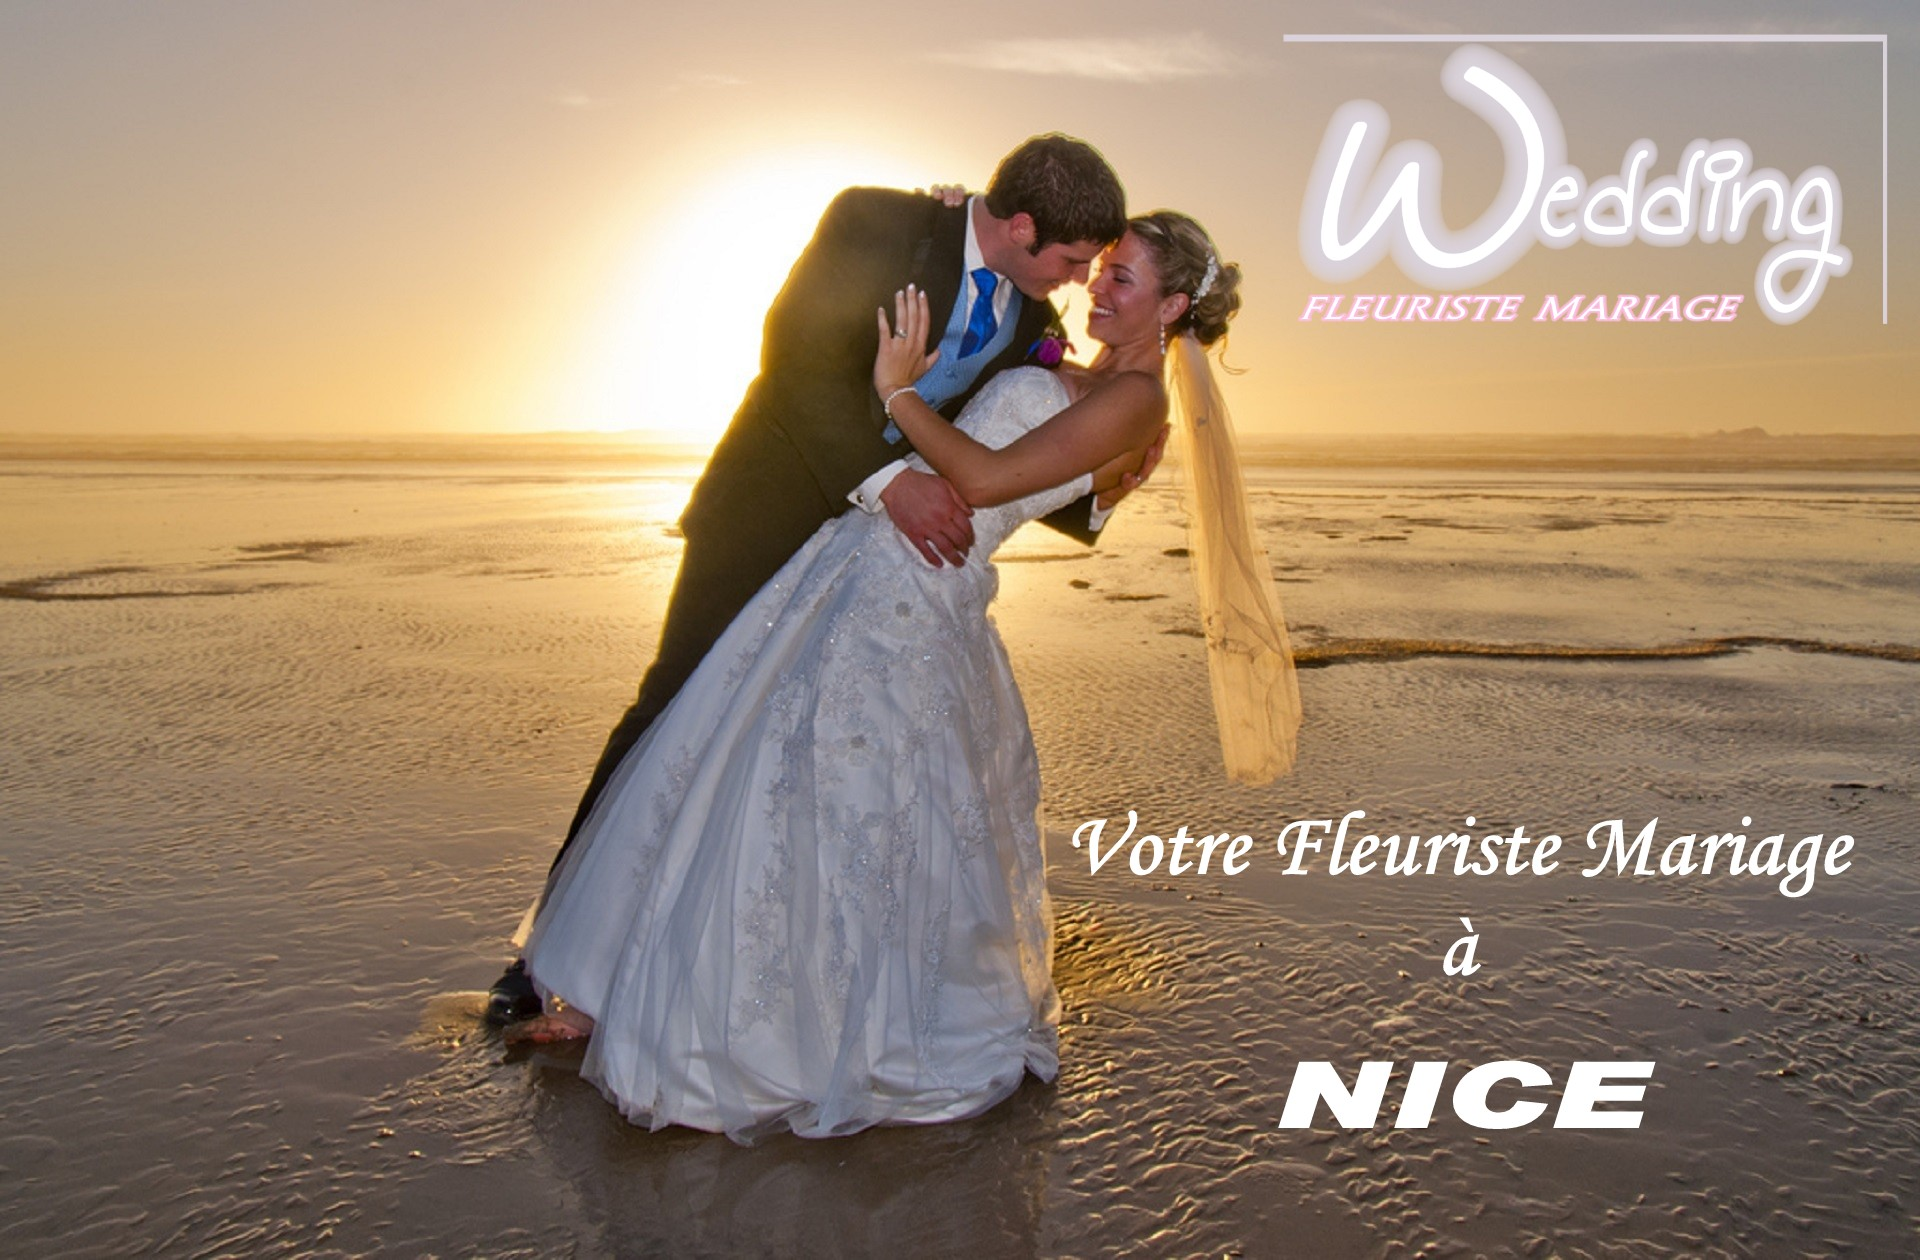 FLEURISTE MARIAGE NICE - WEDDING PLANNER NICE - TRAITEUR NICE